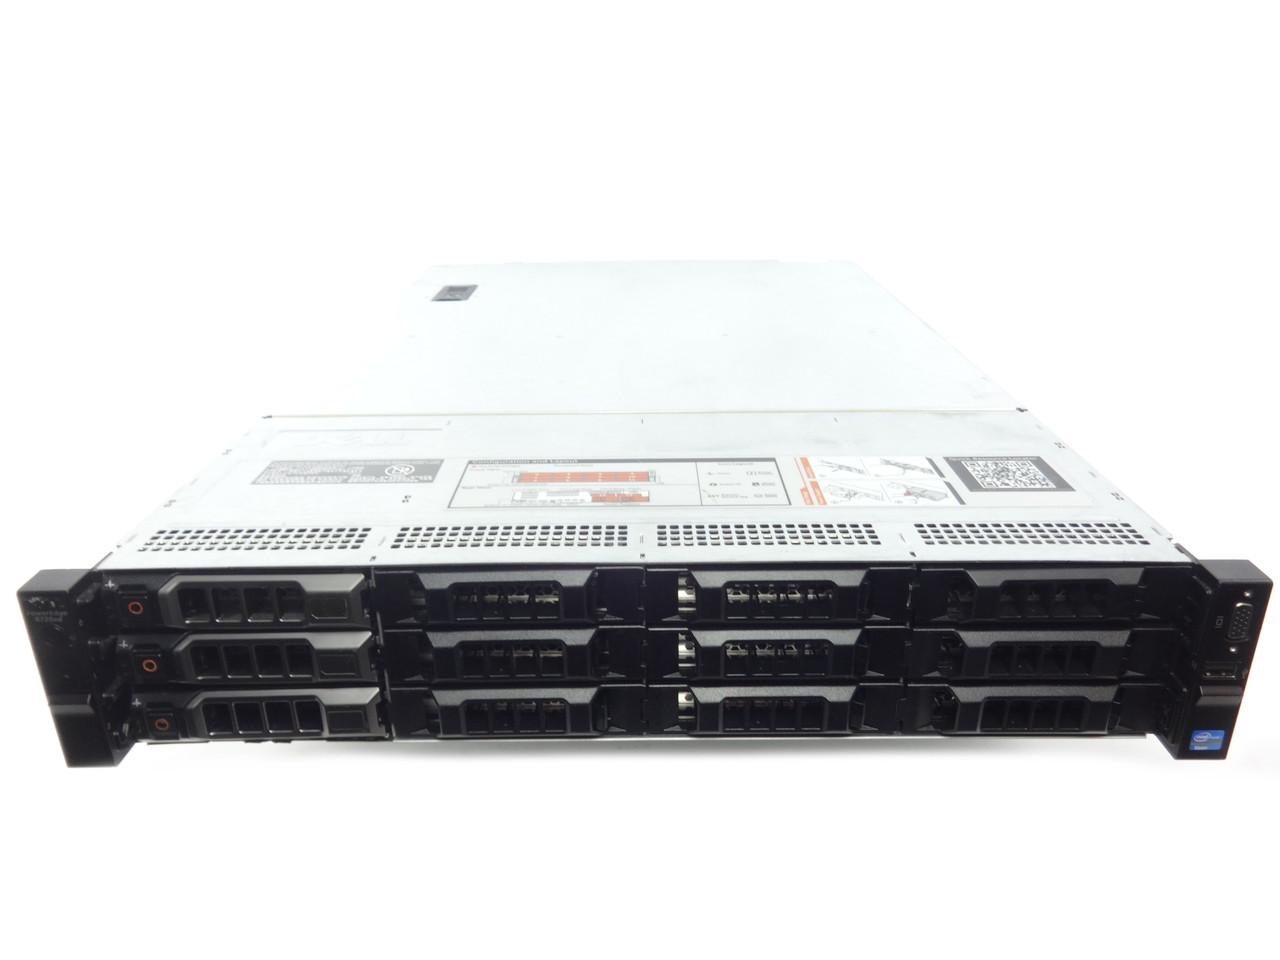 Dell Poweredge R720XD LFF Server